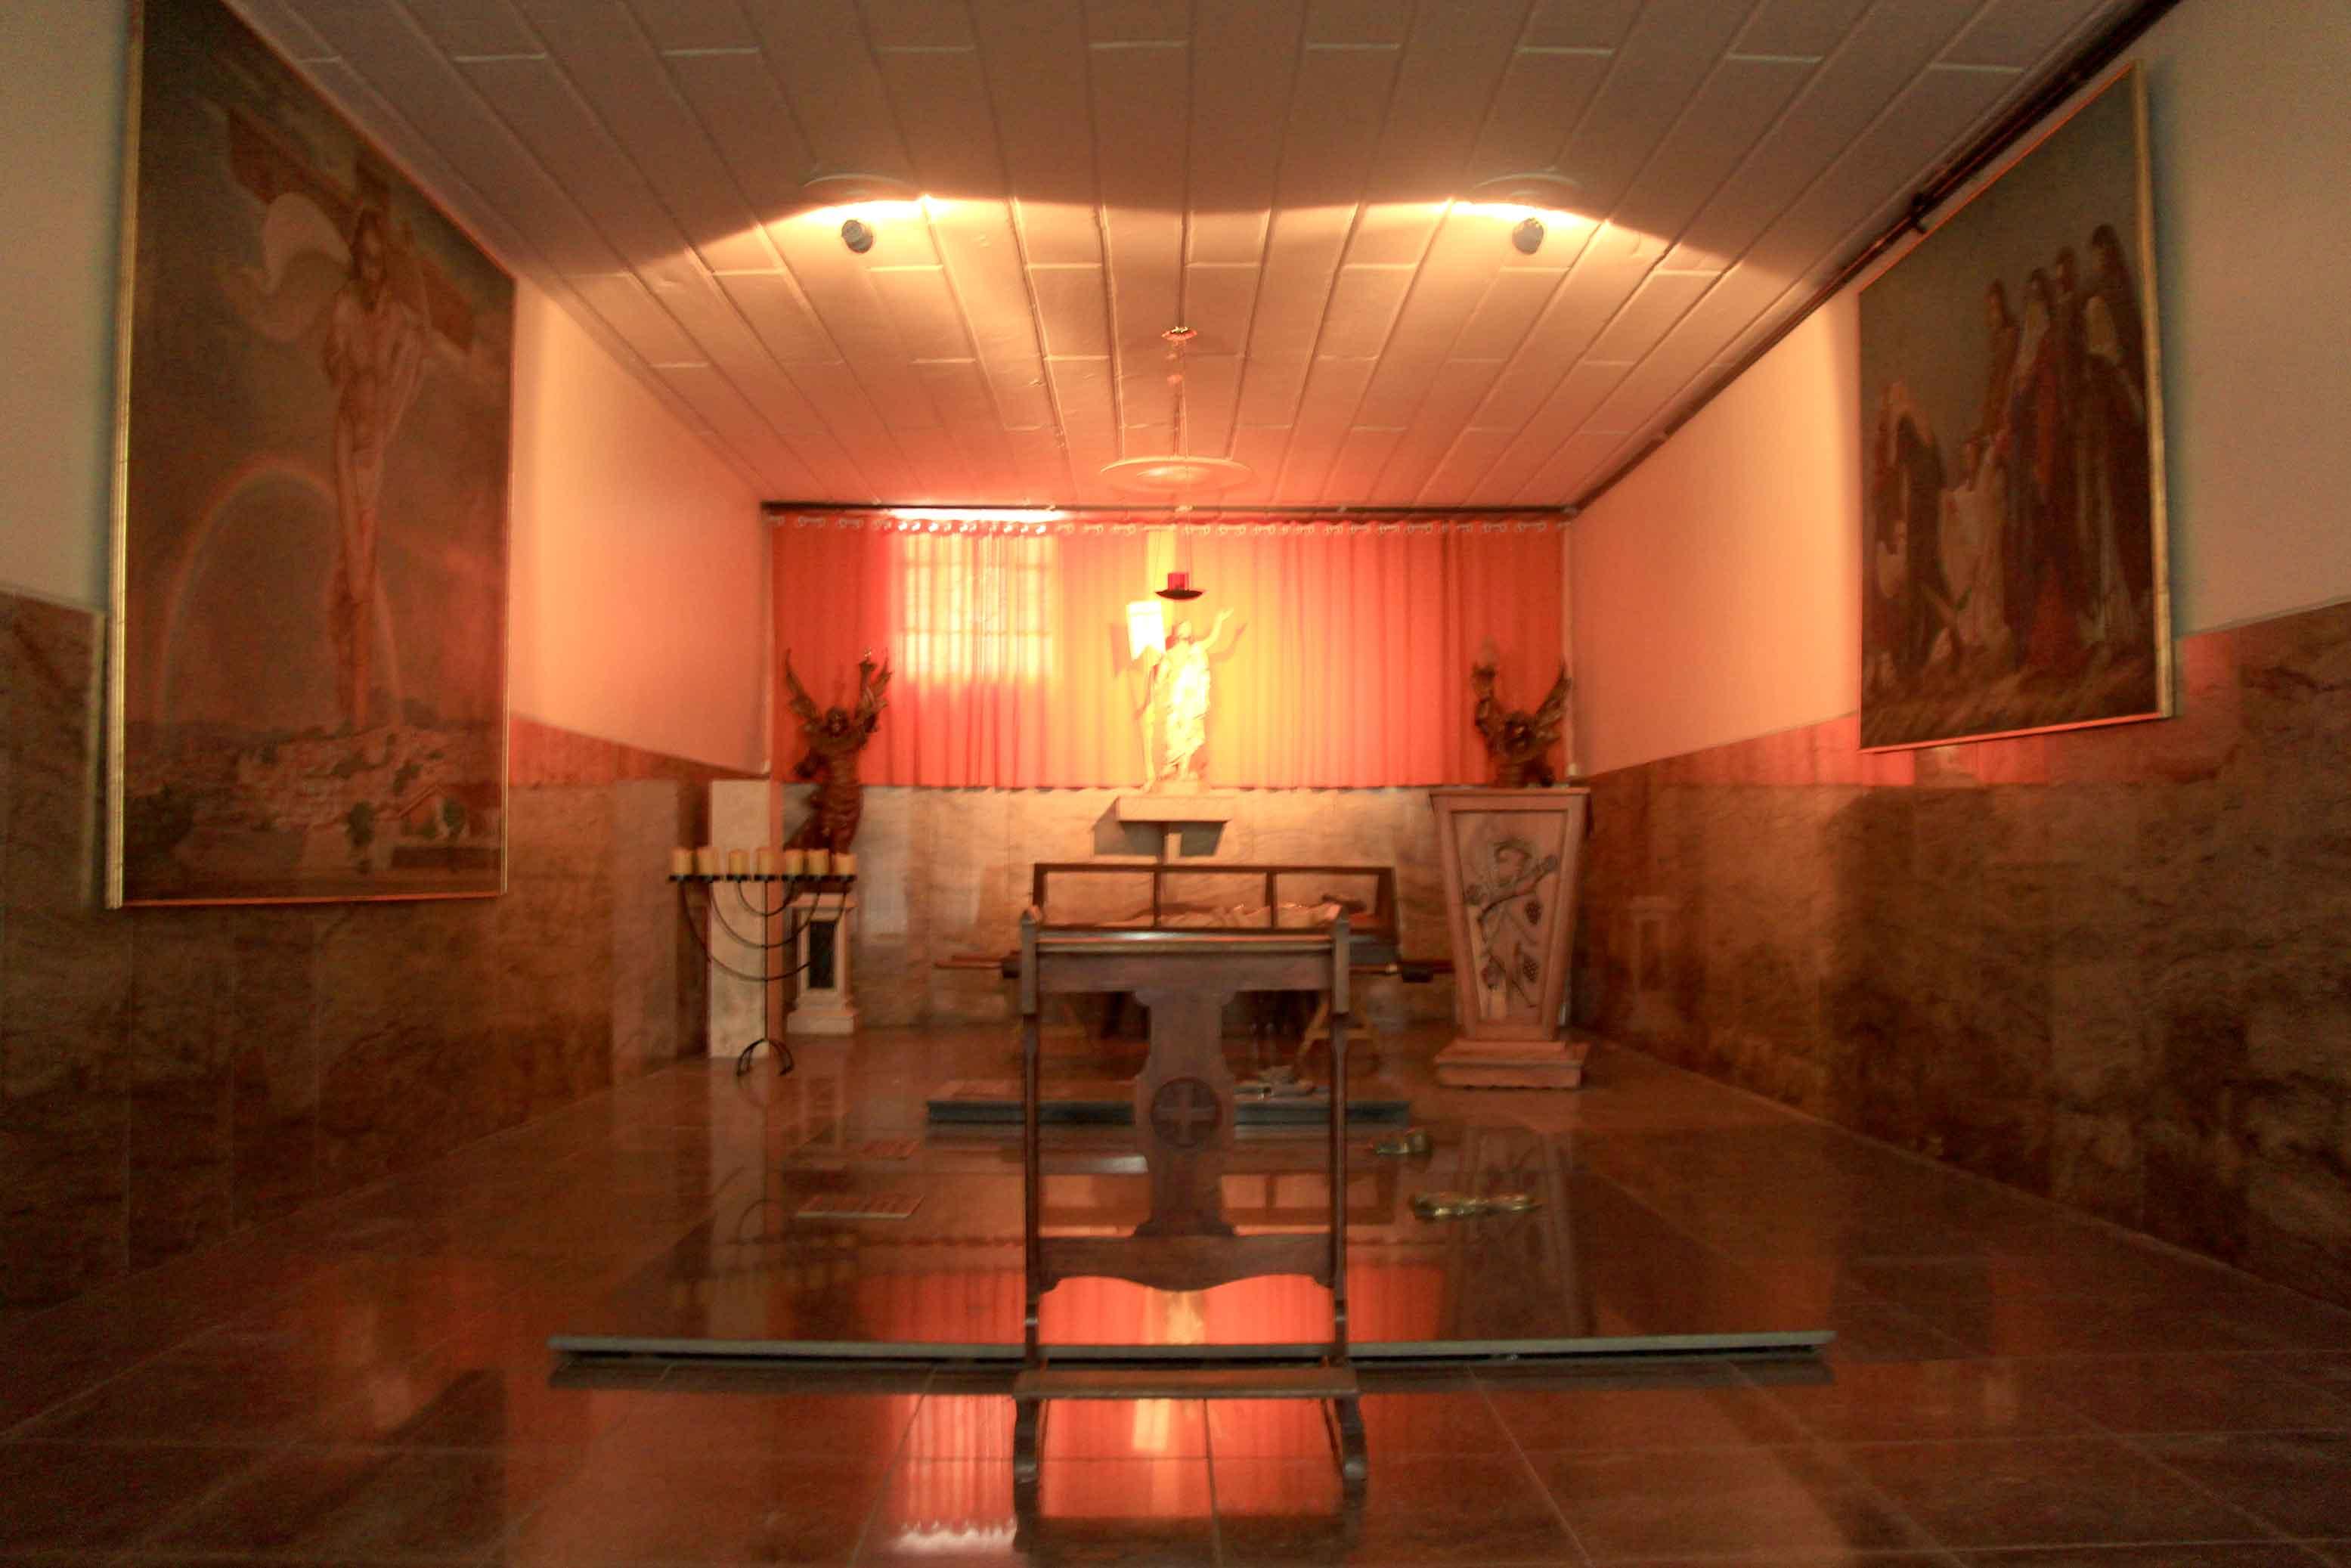 Acervo da Paróquia de Bragança Paulista -Cripta da Catedral